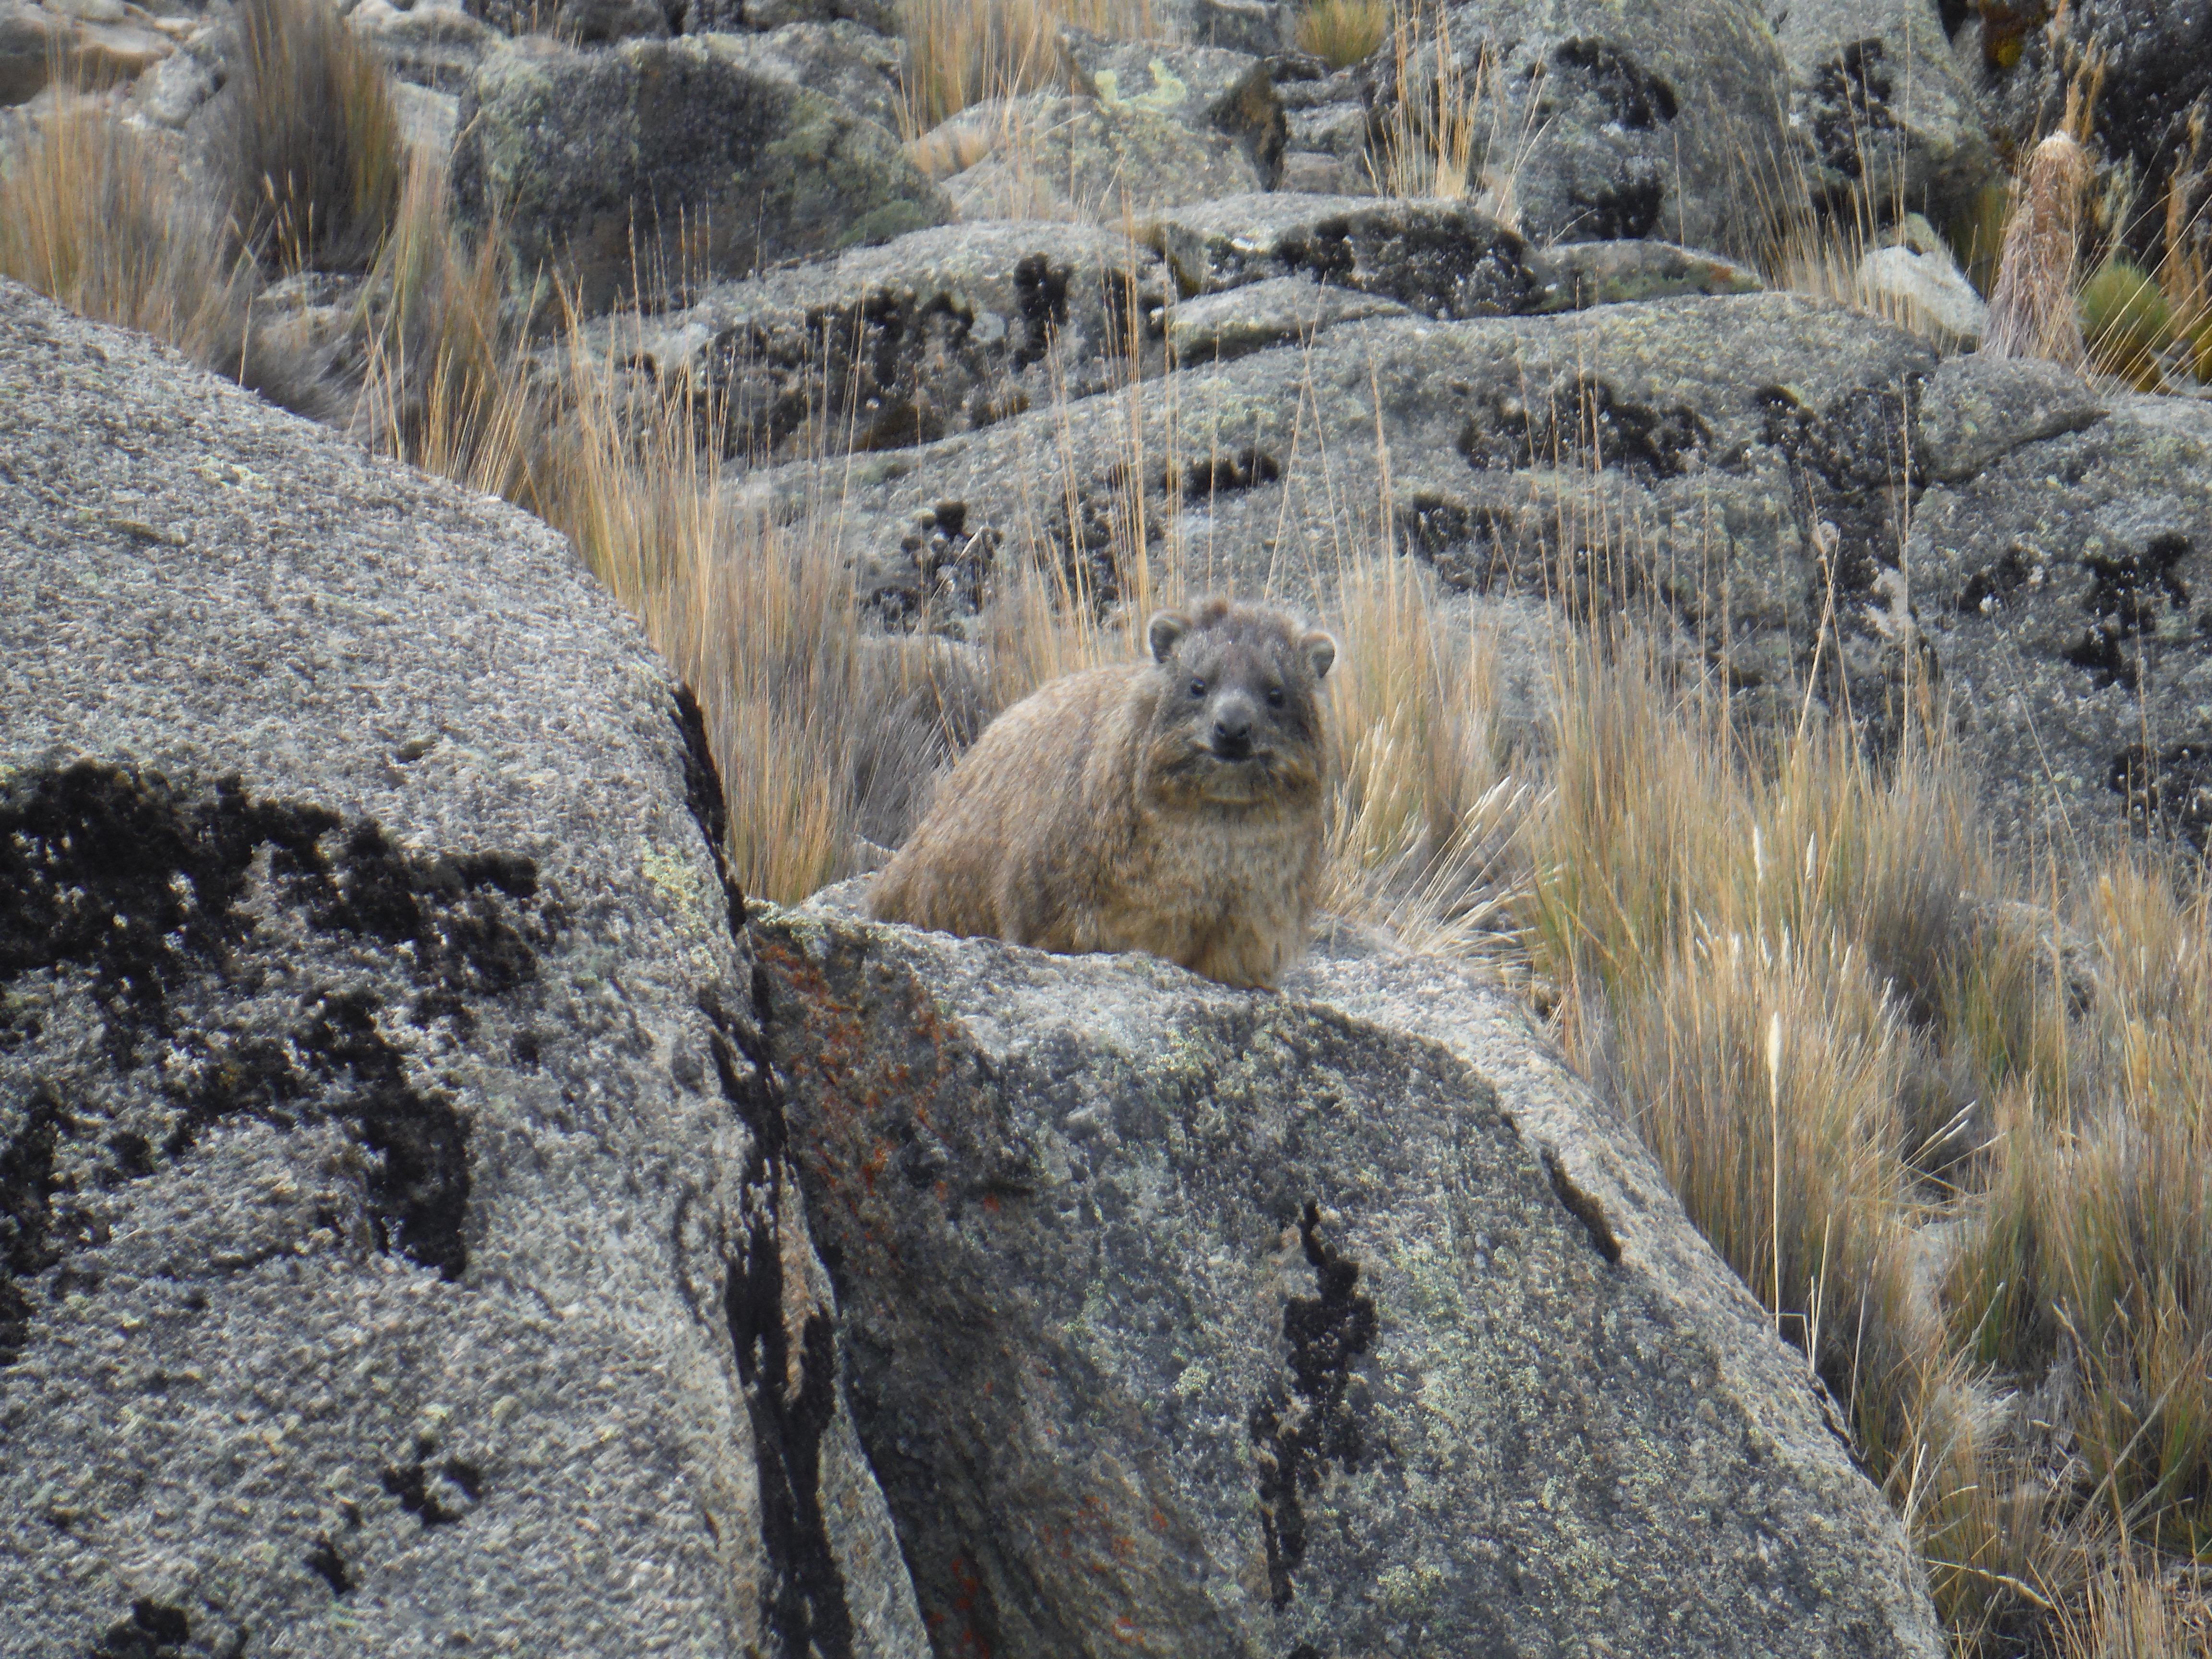 Rock hyrax in Kenya